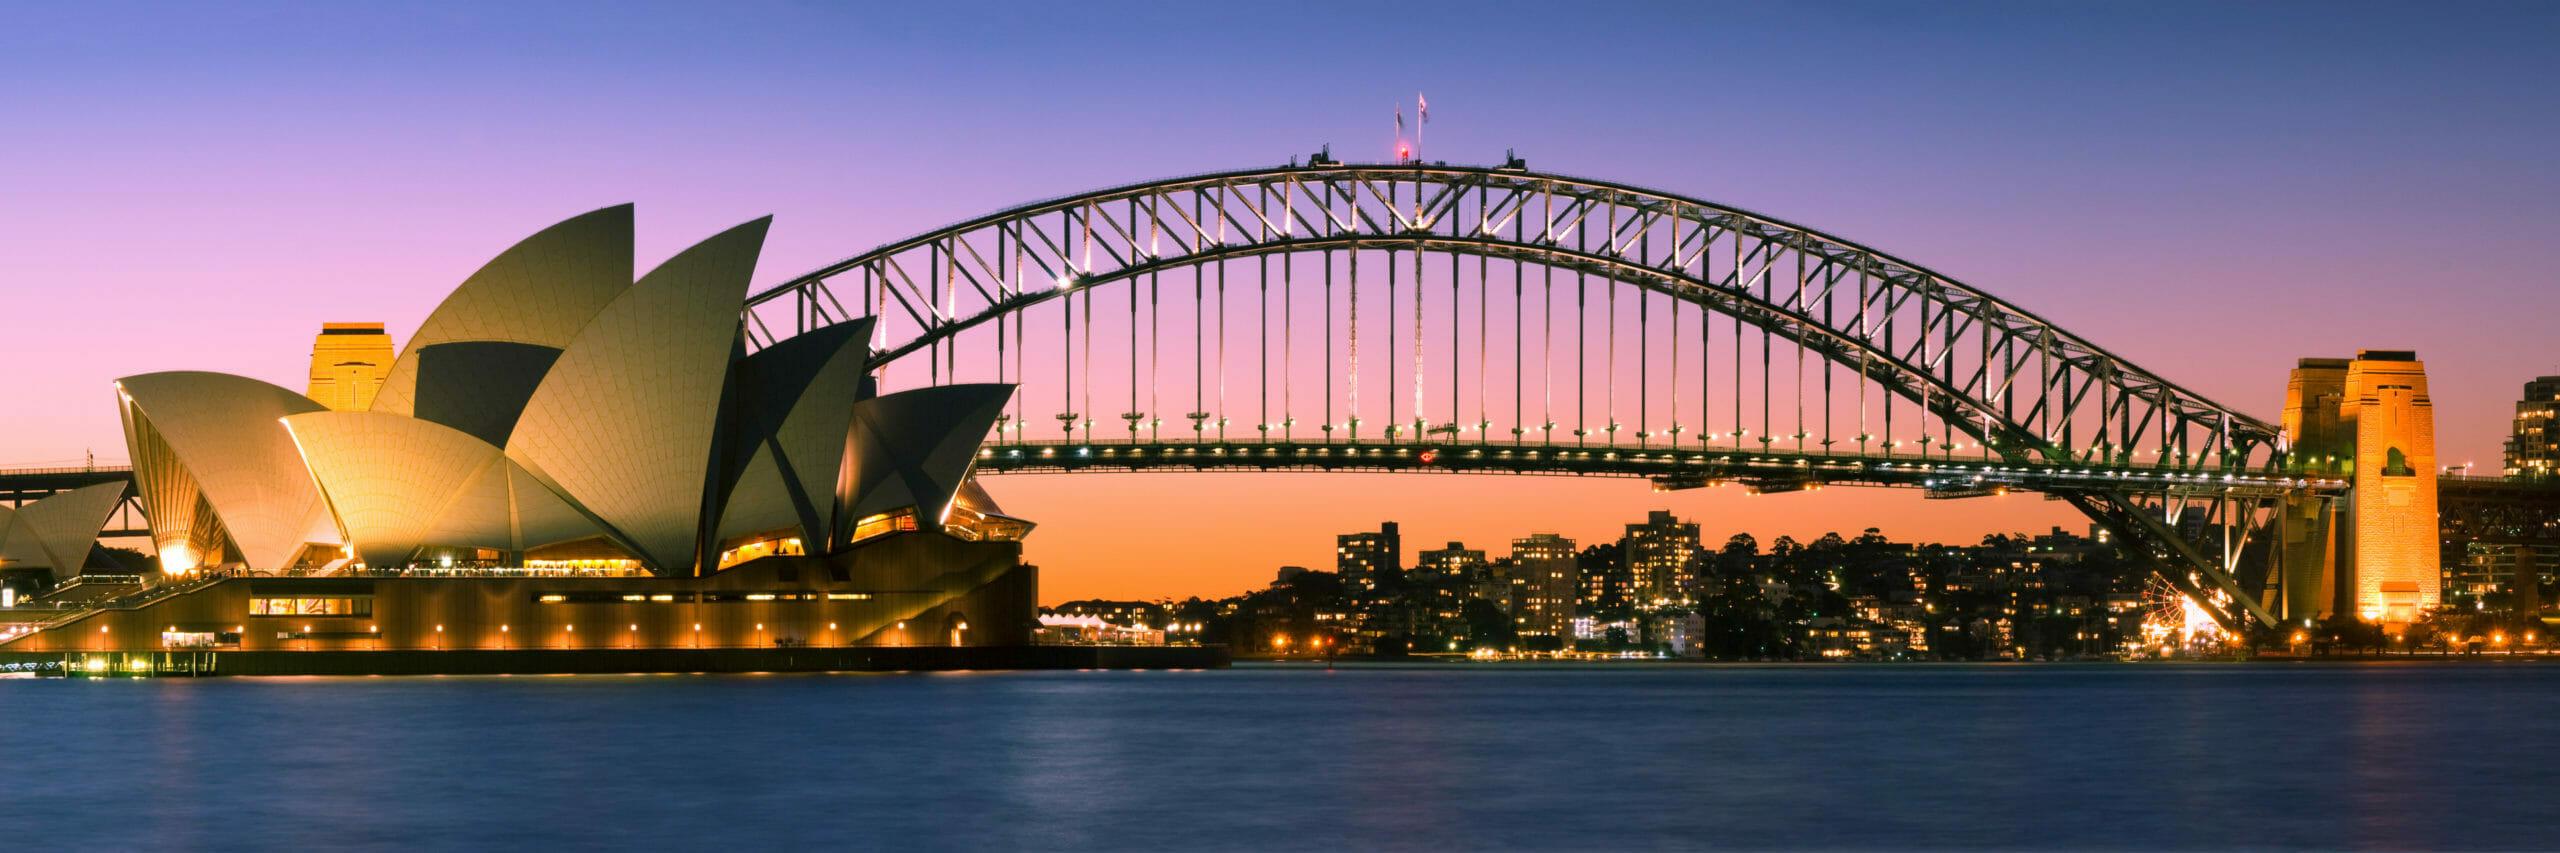 http://www.dreamstime.com/royalty-free-stock-image-sydney-harbour-skyline-panorama-twilight-image20467586